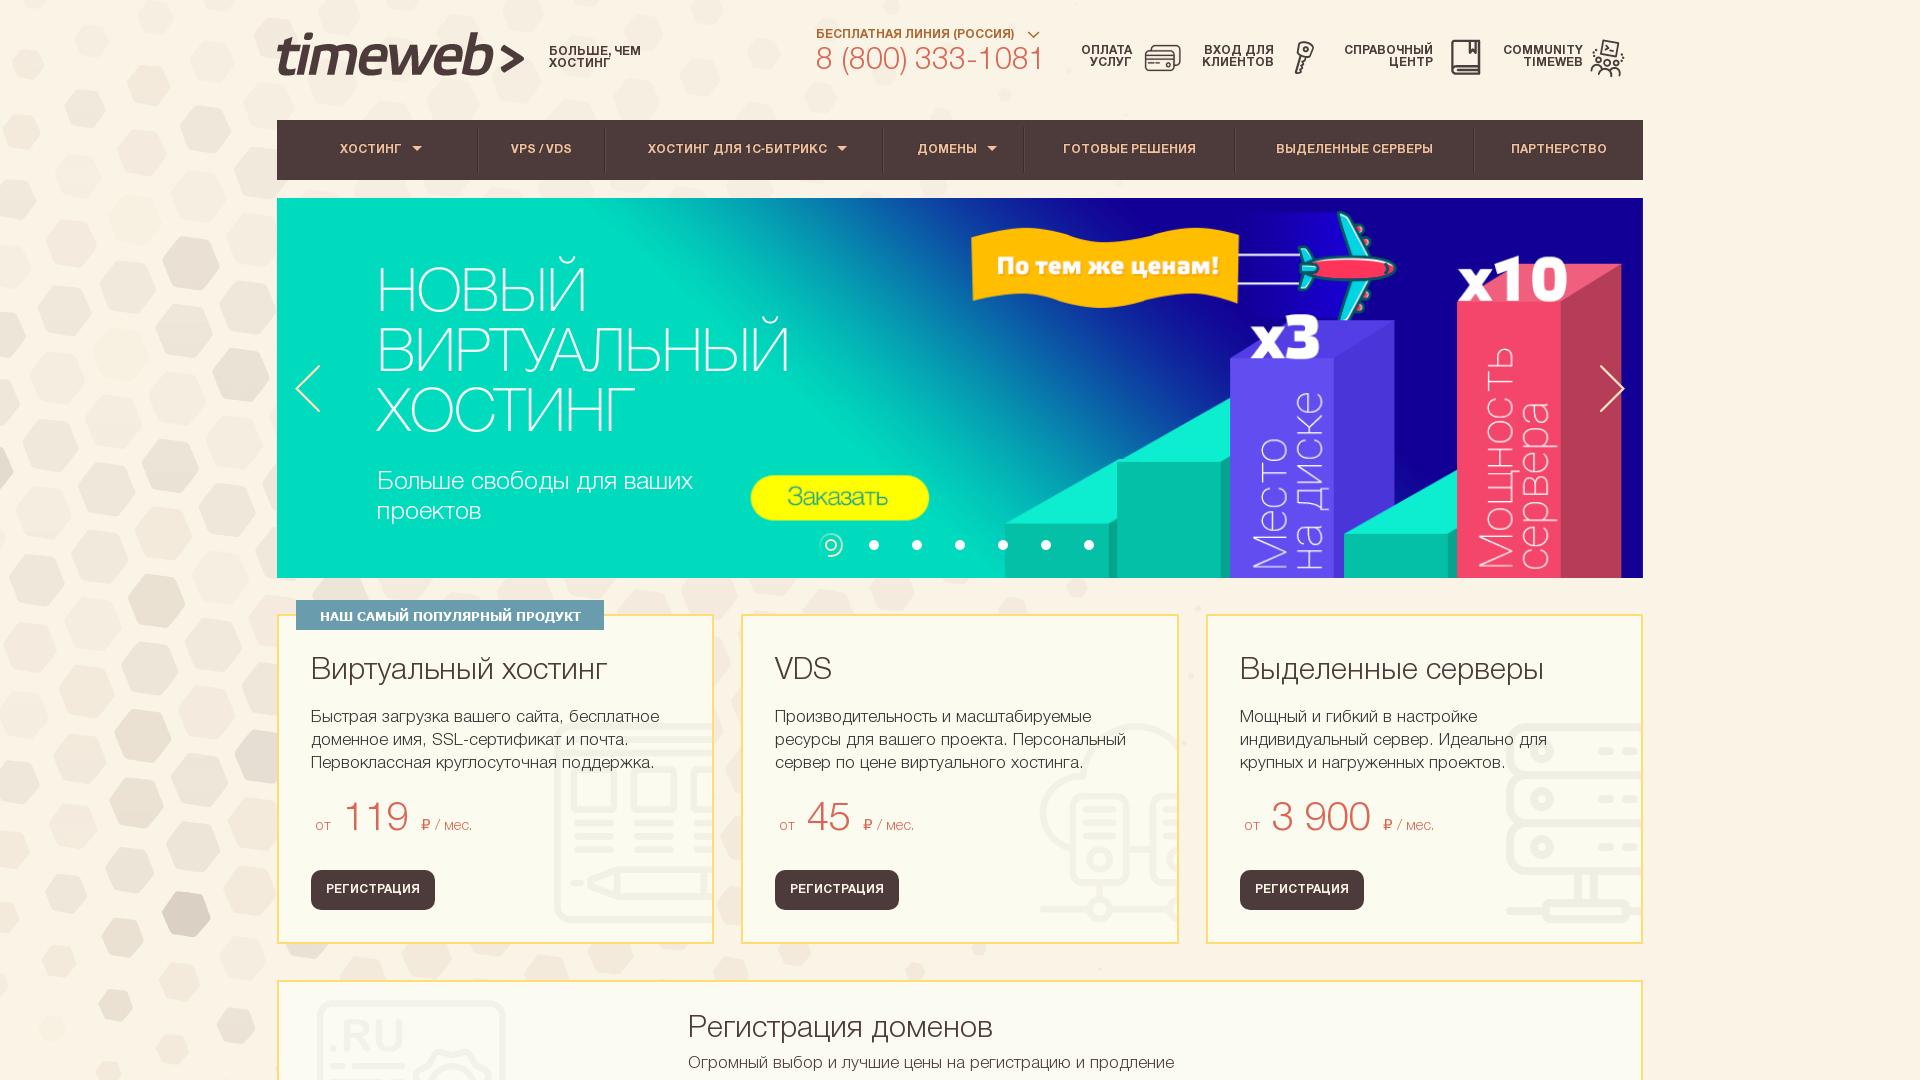 Timeweb Many GEOs website